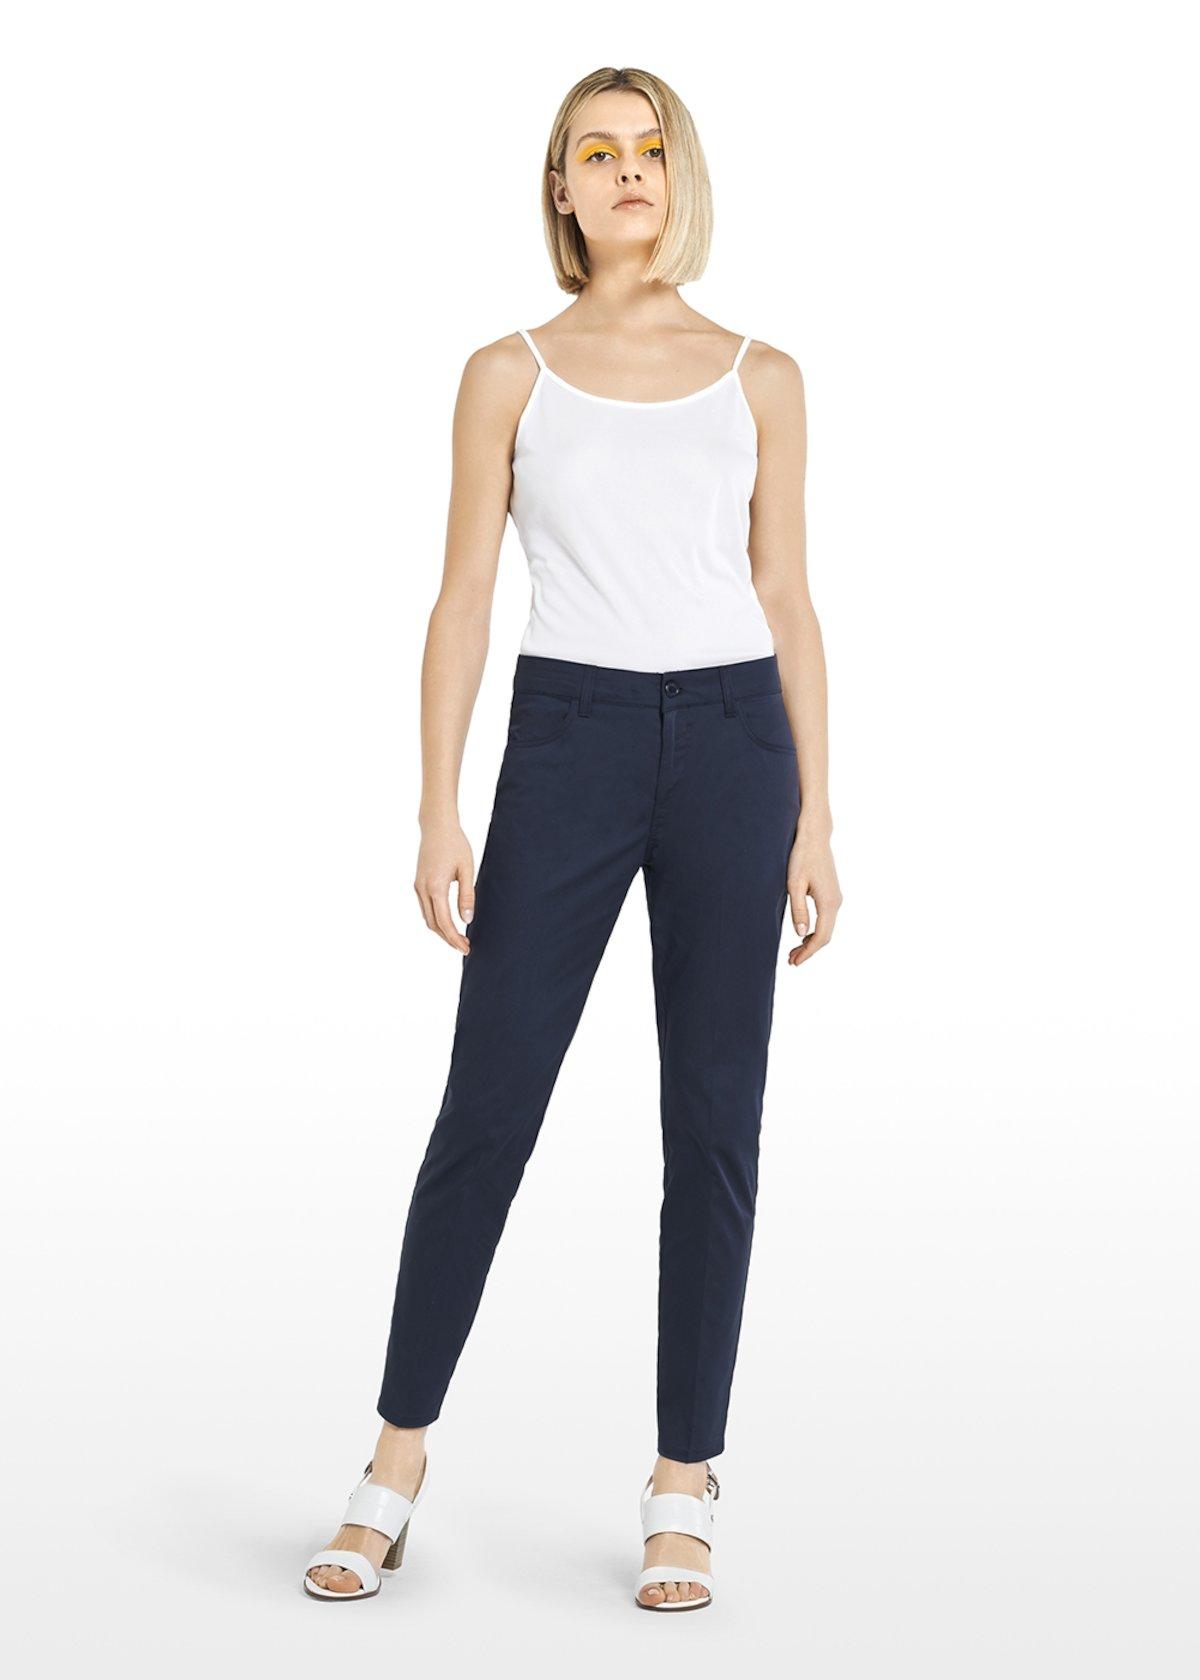 Kate C cotton trousers - Medium Blue - Woman